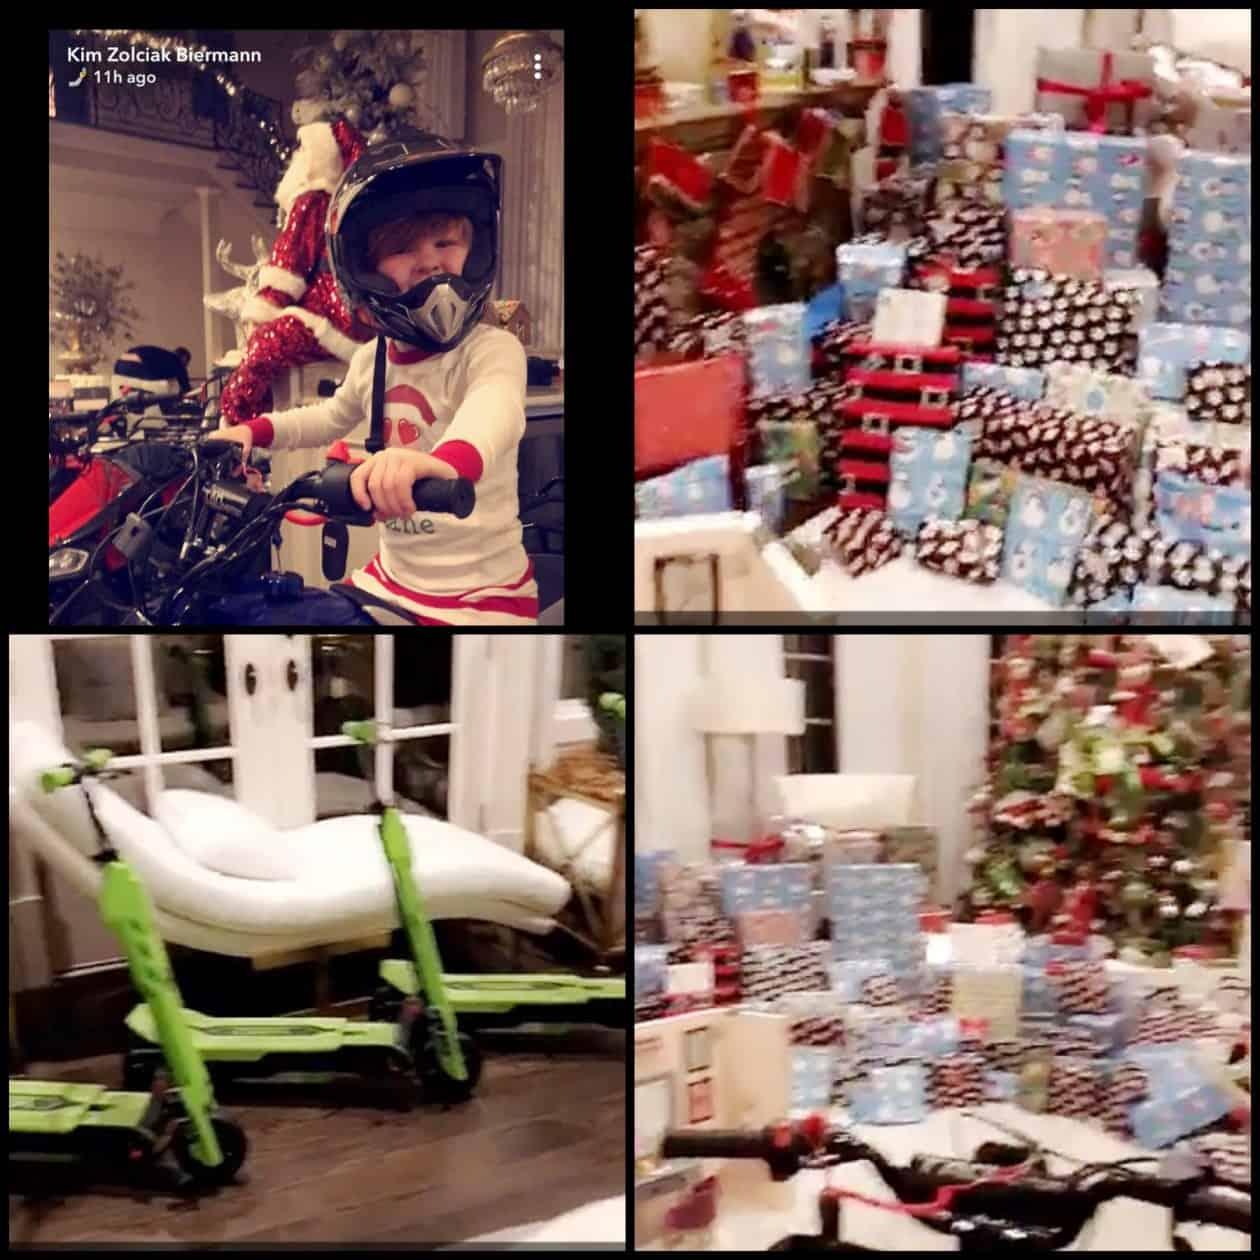 Kim Zolciak children gifts photos